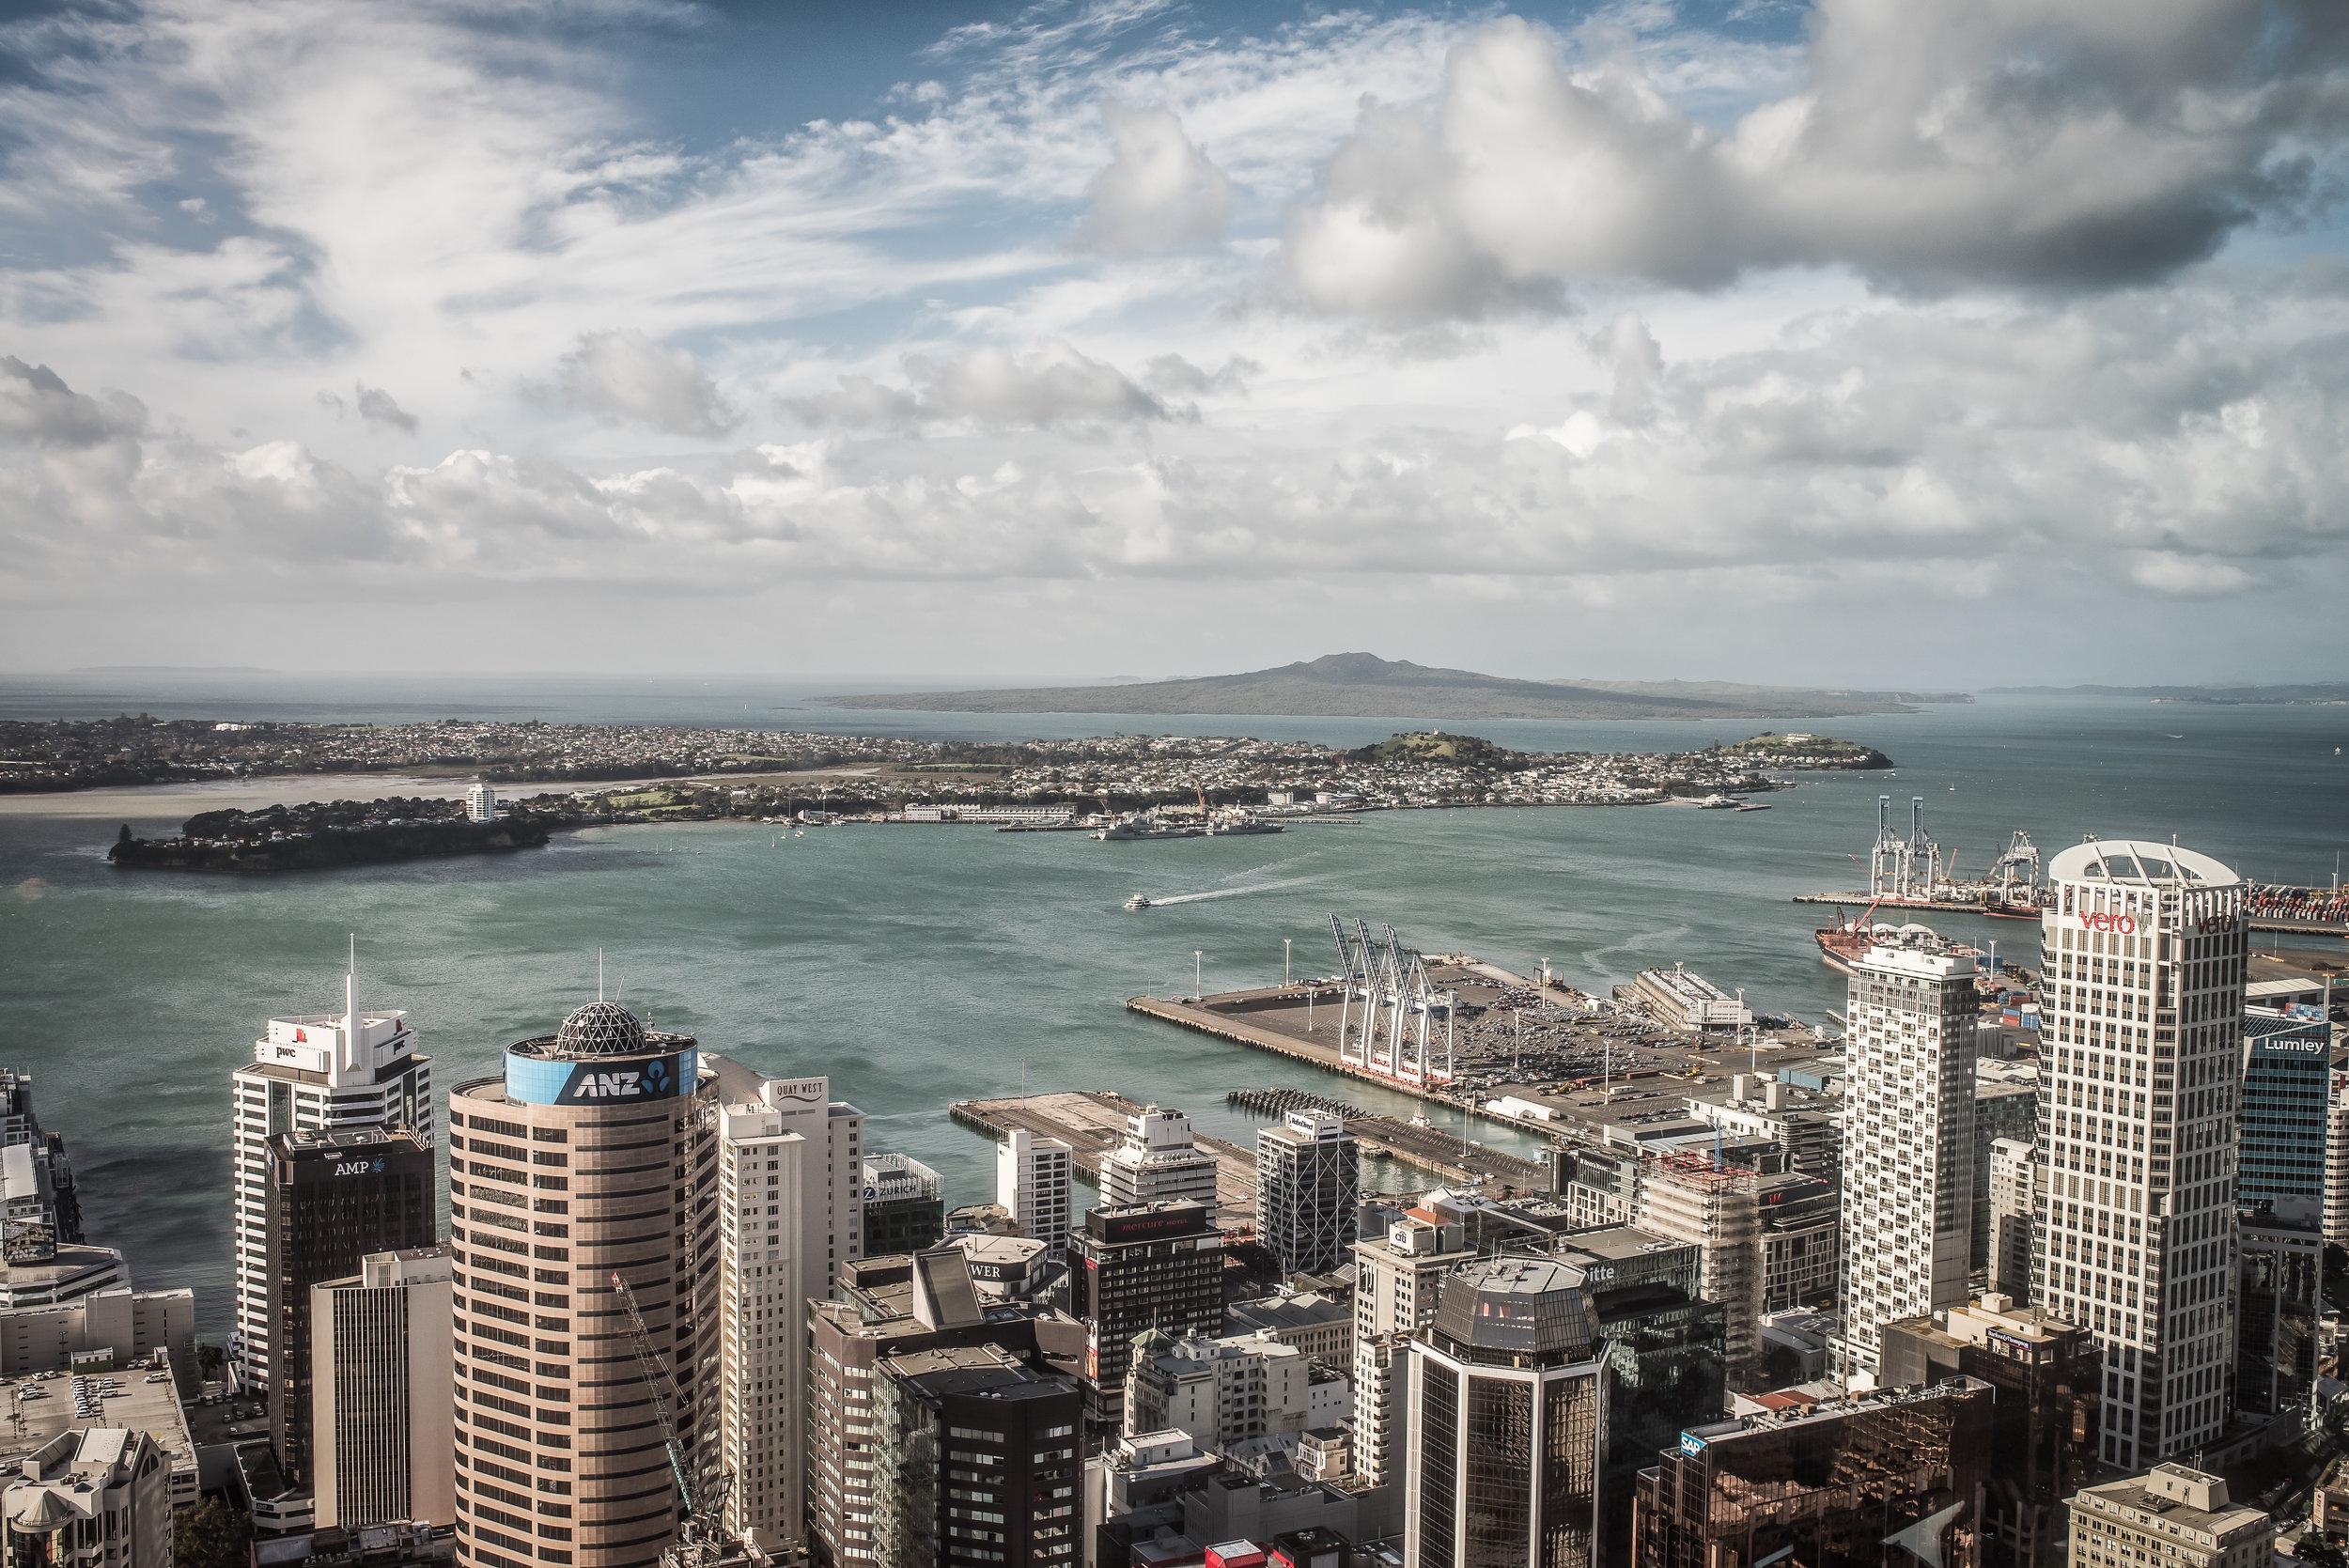 35mmSkyTower_city_renrob©.jpg